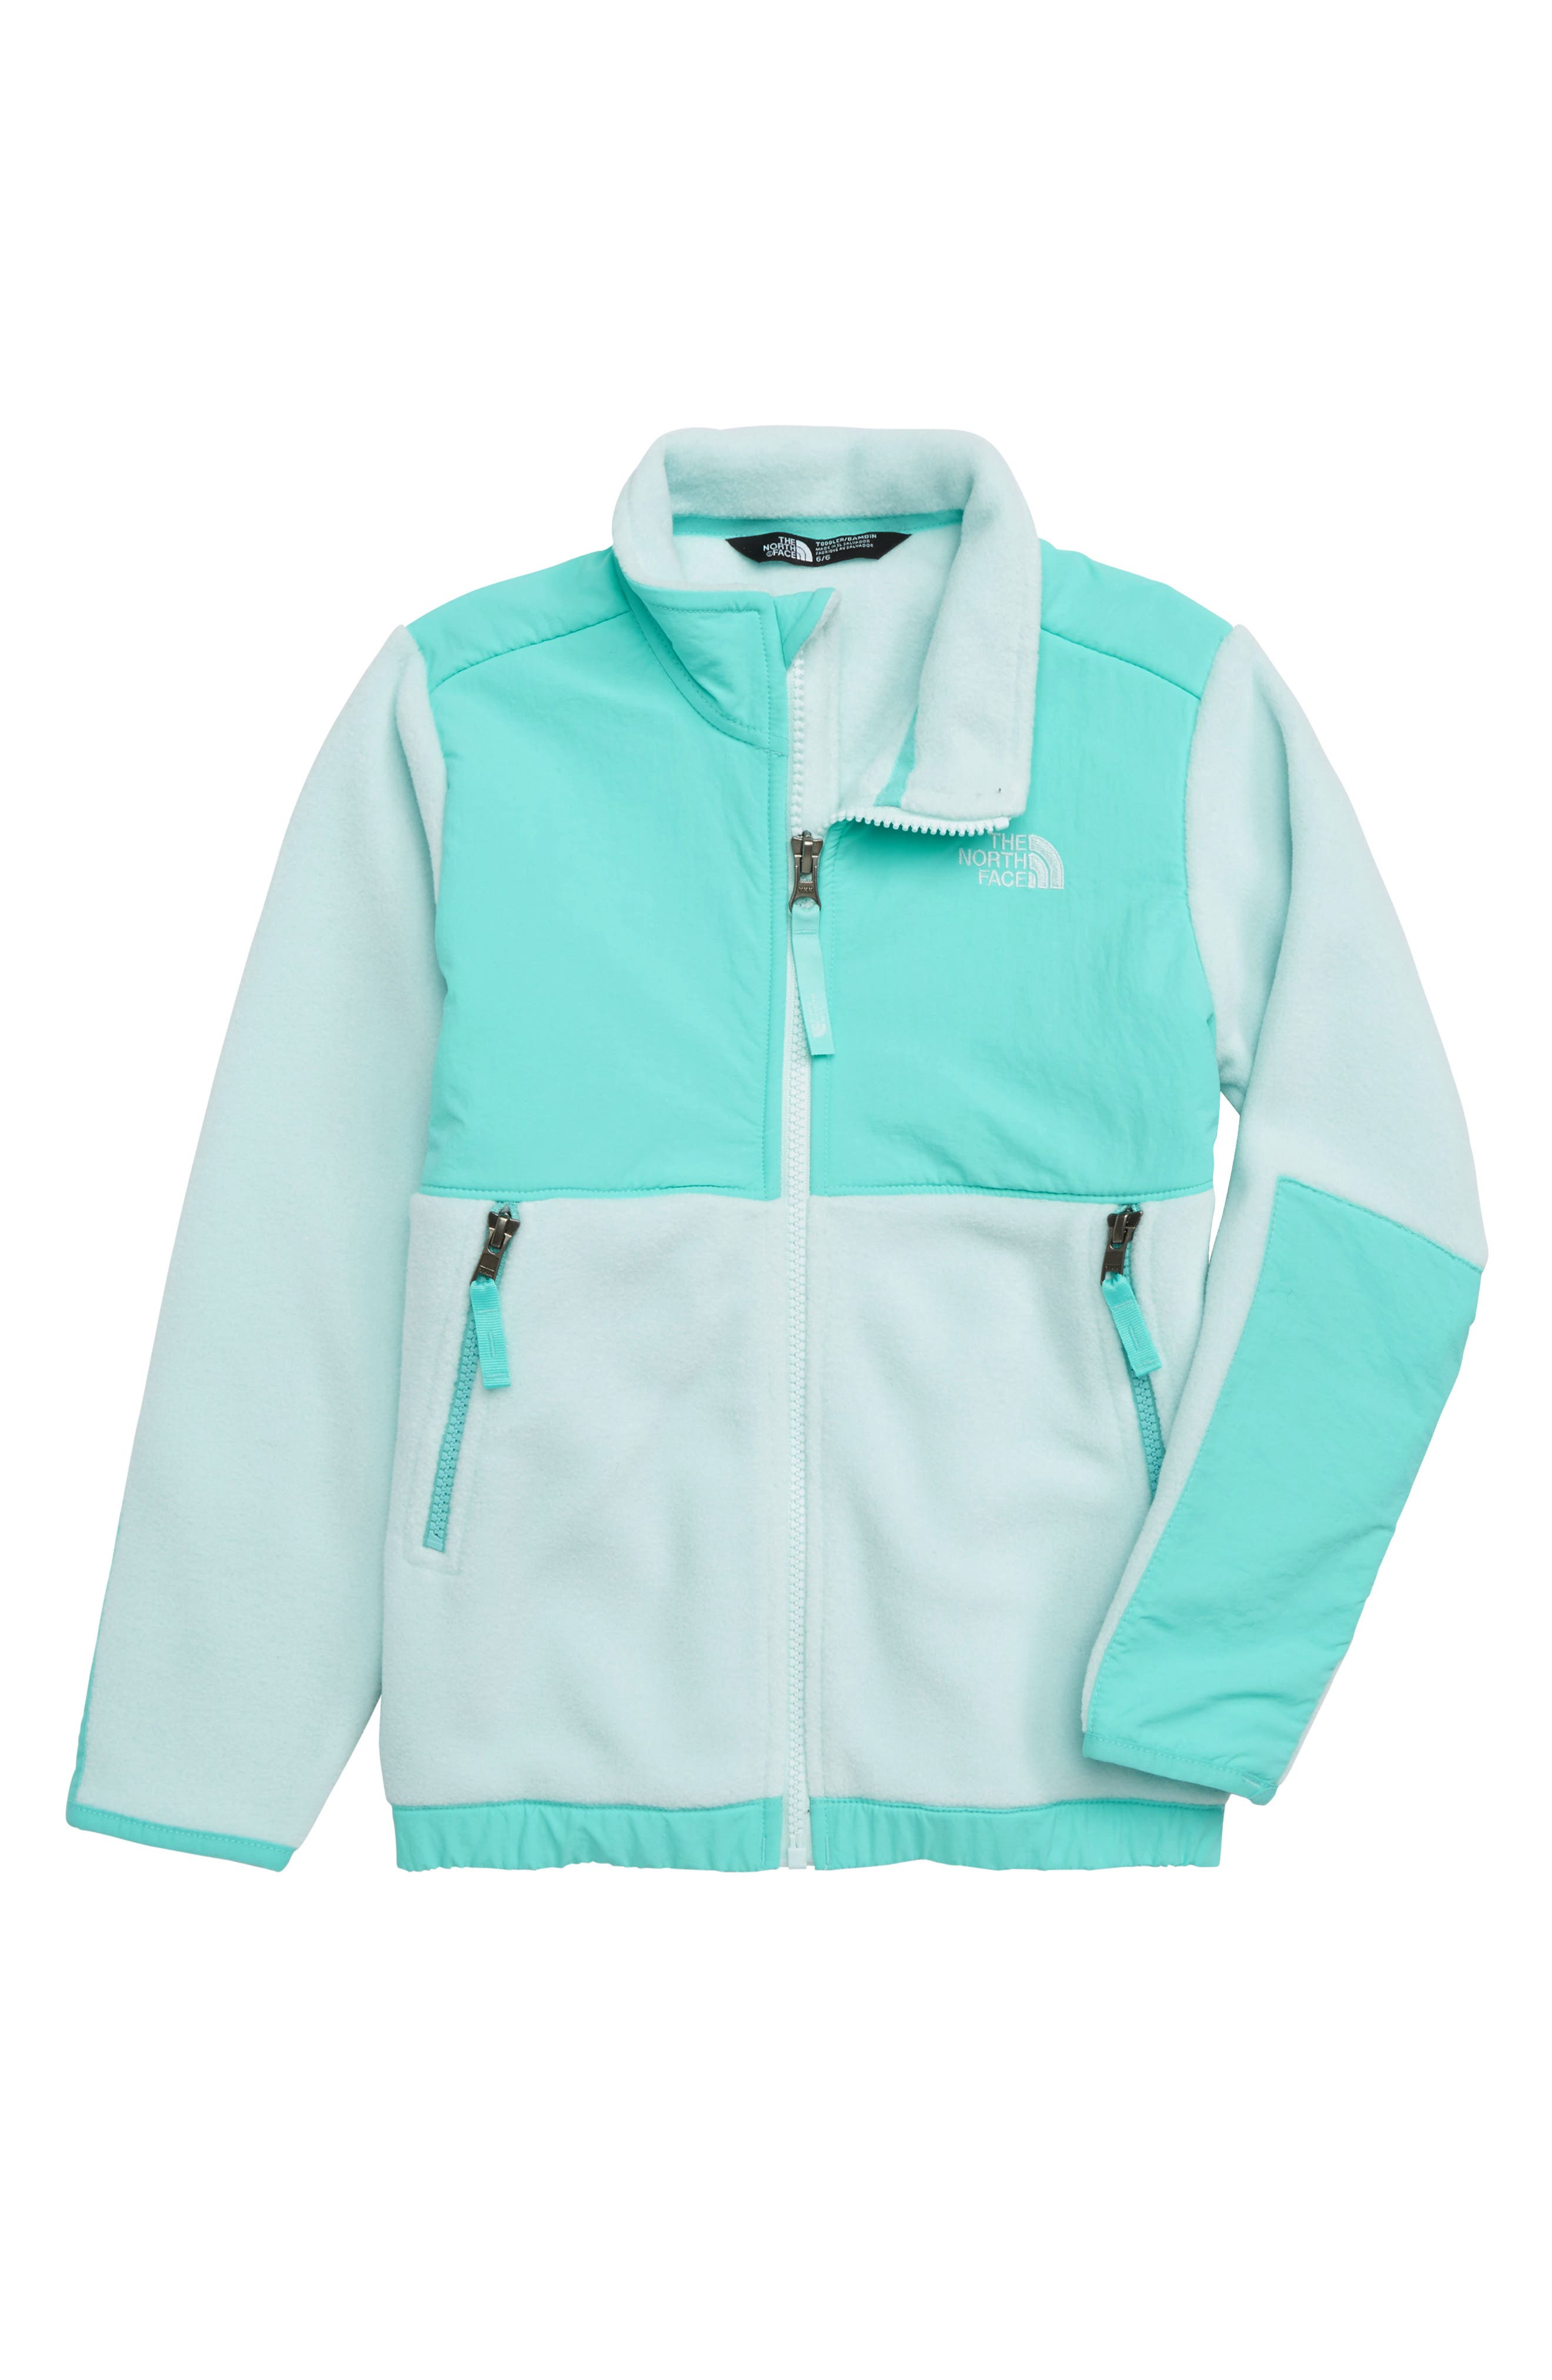 Denali Recycled Fleece Jacket, Main, color, ORIGIN BLUE